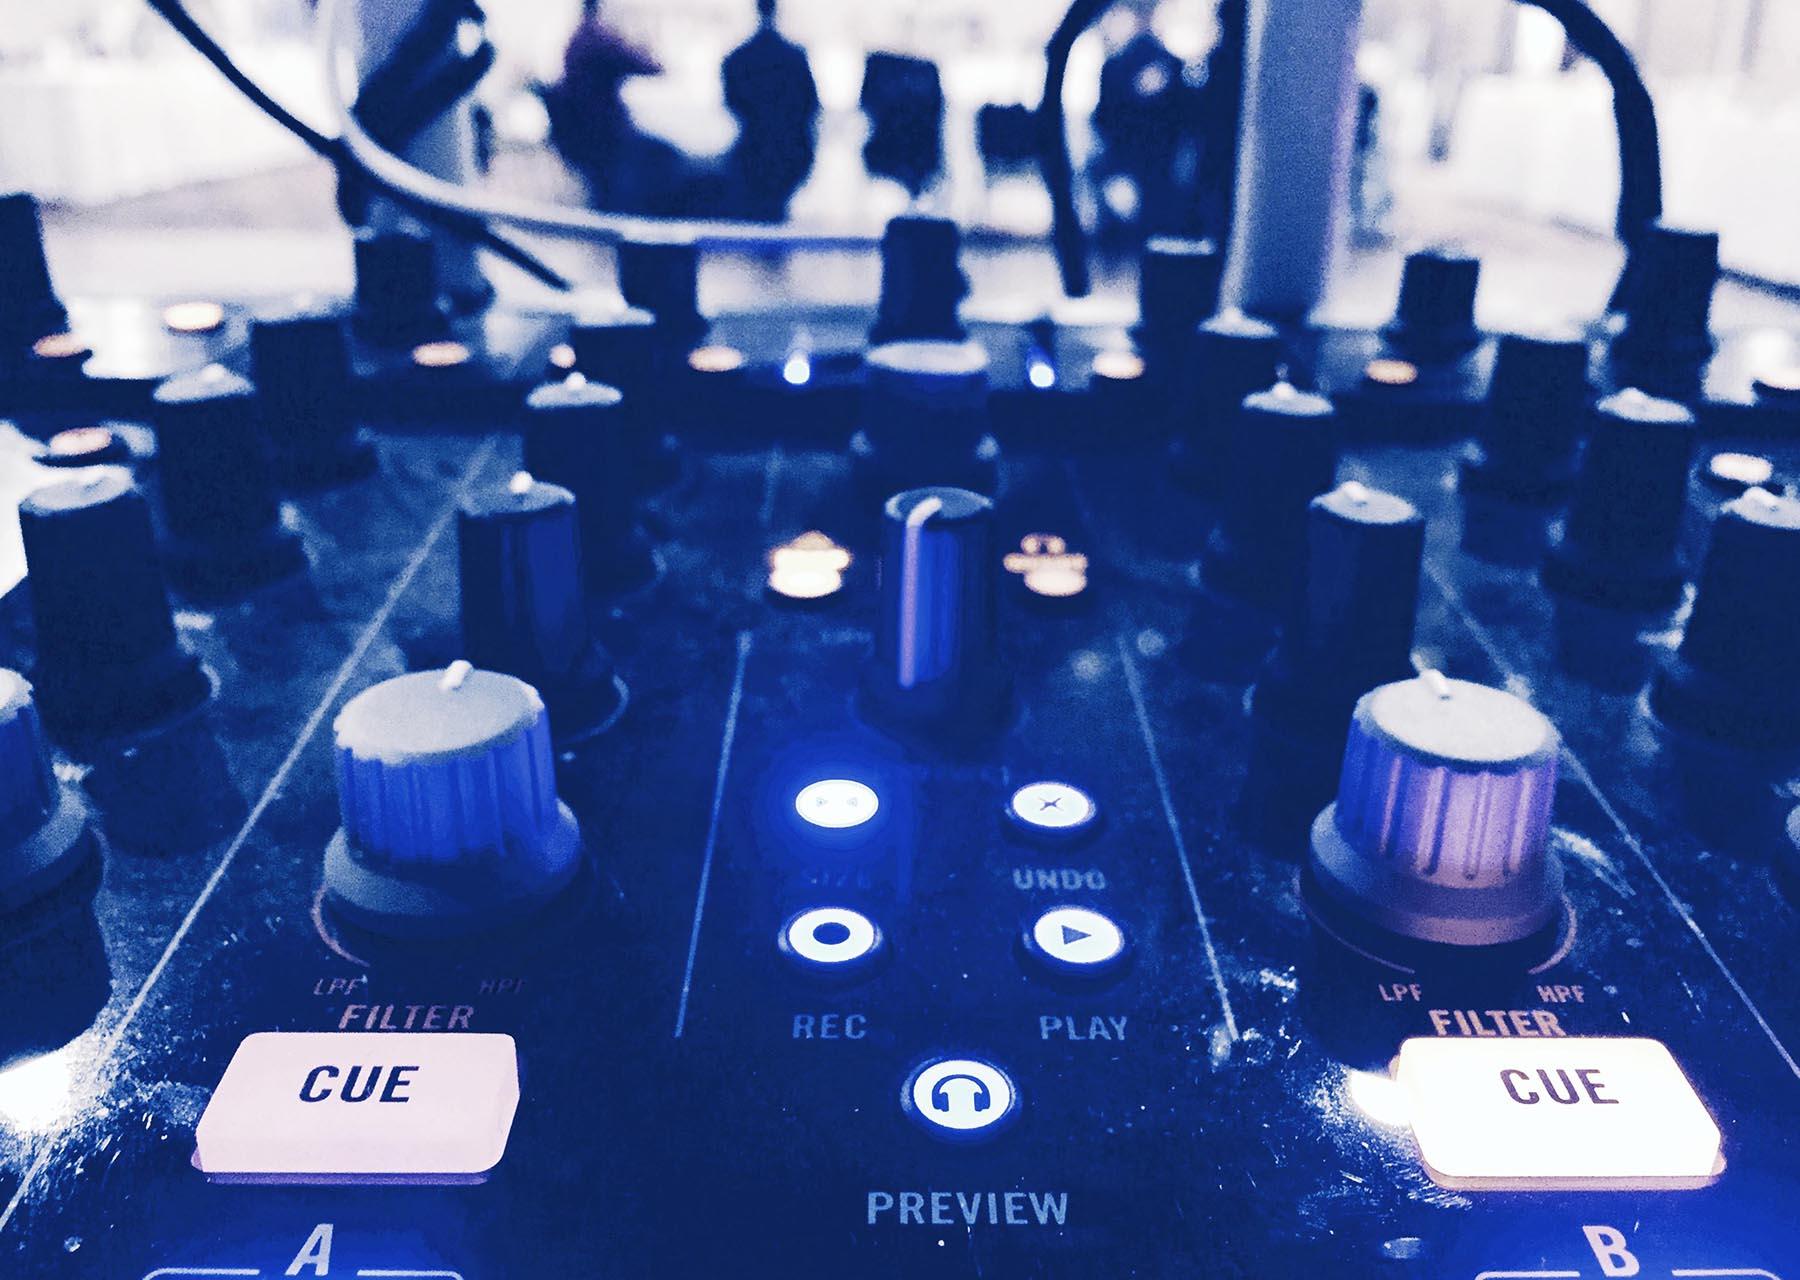 soulful_sounder-gear copy.jpg